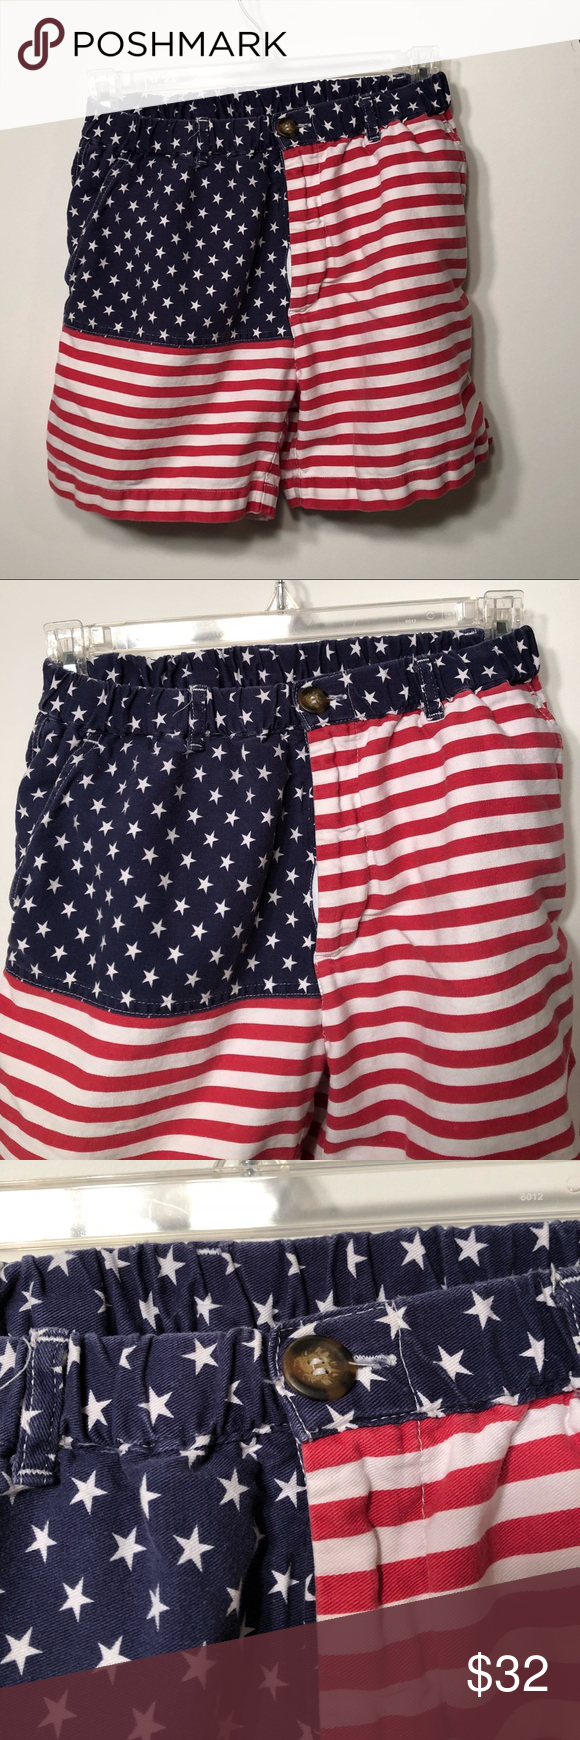 Chubbies Mericas American Flag Usa Shorts Small Chubbies Mericas American Flag Usa Shorts In Size Small 5 5 Inch I Usa Shorts Chubbies Shorts Gym Shorts Womens